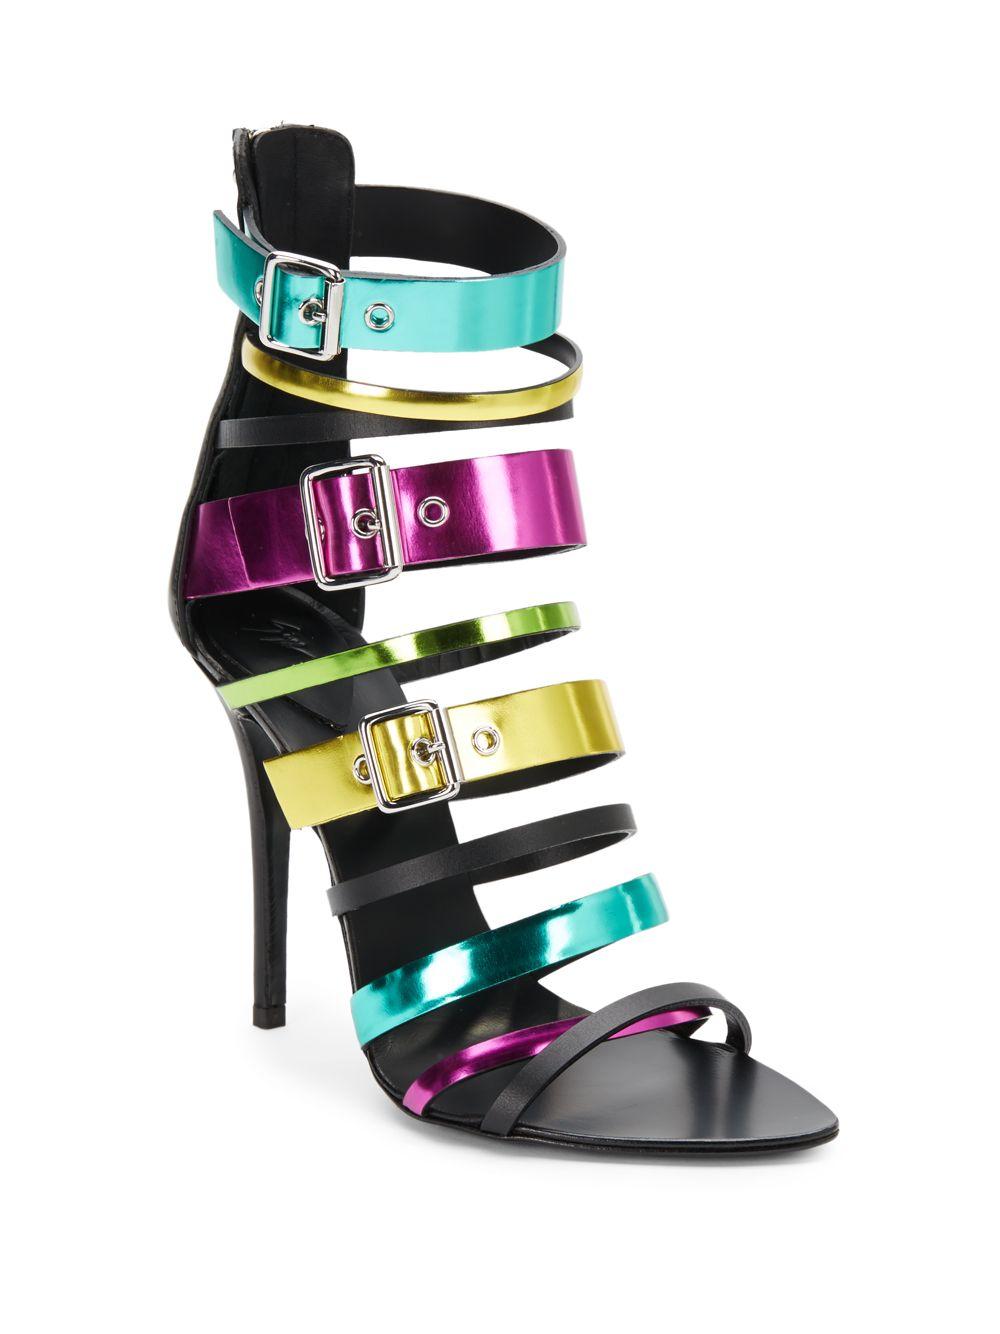 2c6bf2efbfff Lyst - Giuseppe Zanotti Multi Color Metallic Leather Strappy Sandals